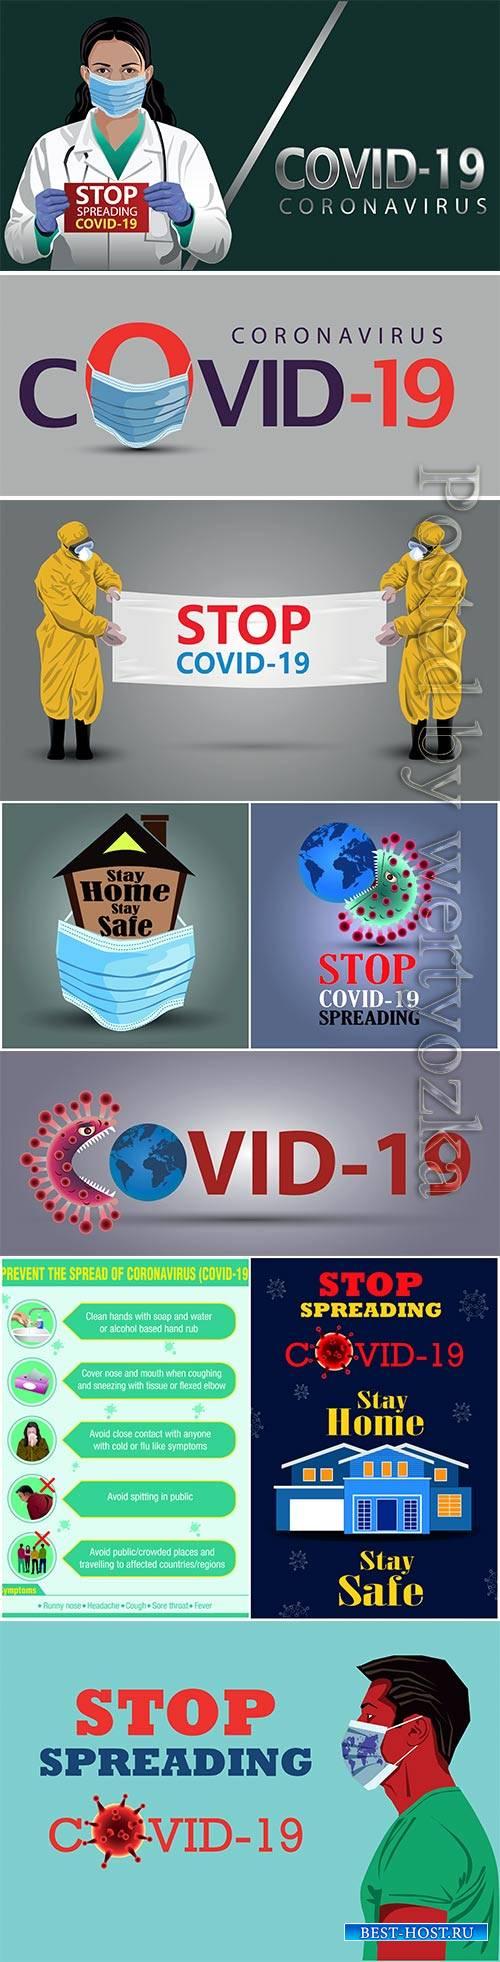 COVID 19, Coranavirus vector illustration sets # 15